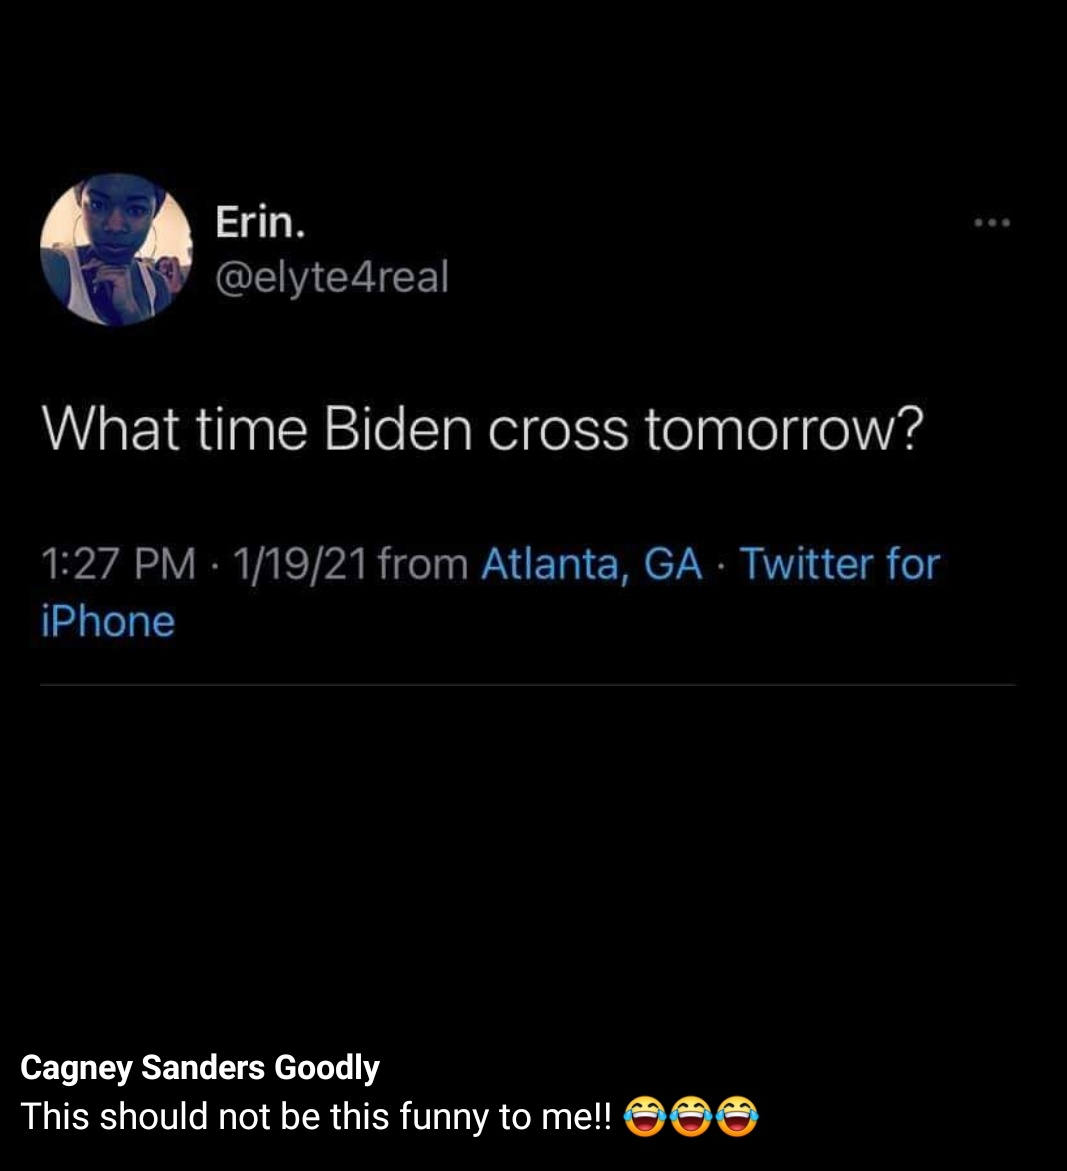 But what is his line name going to be? #BidenHarris2020 #BidenHarrisInauguration